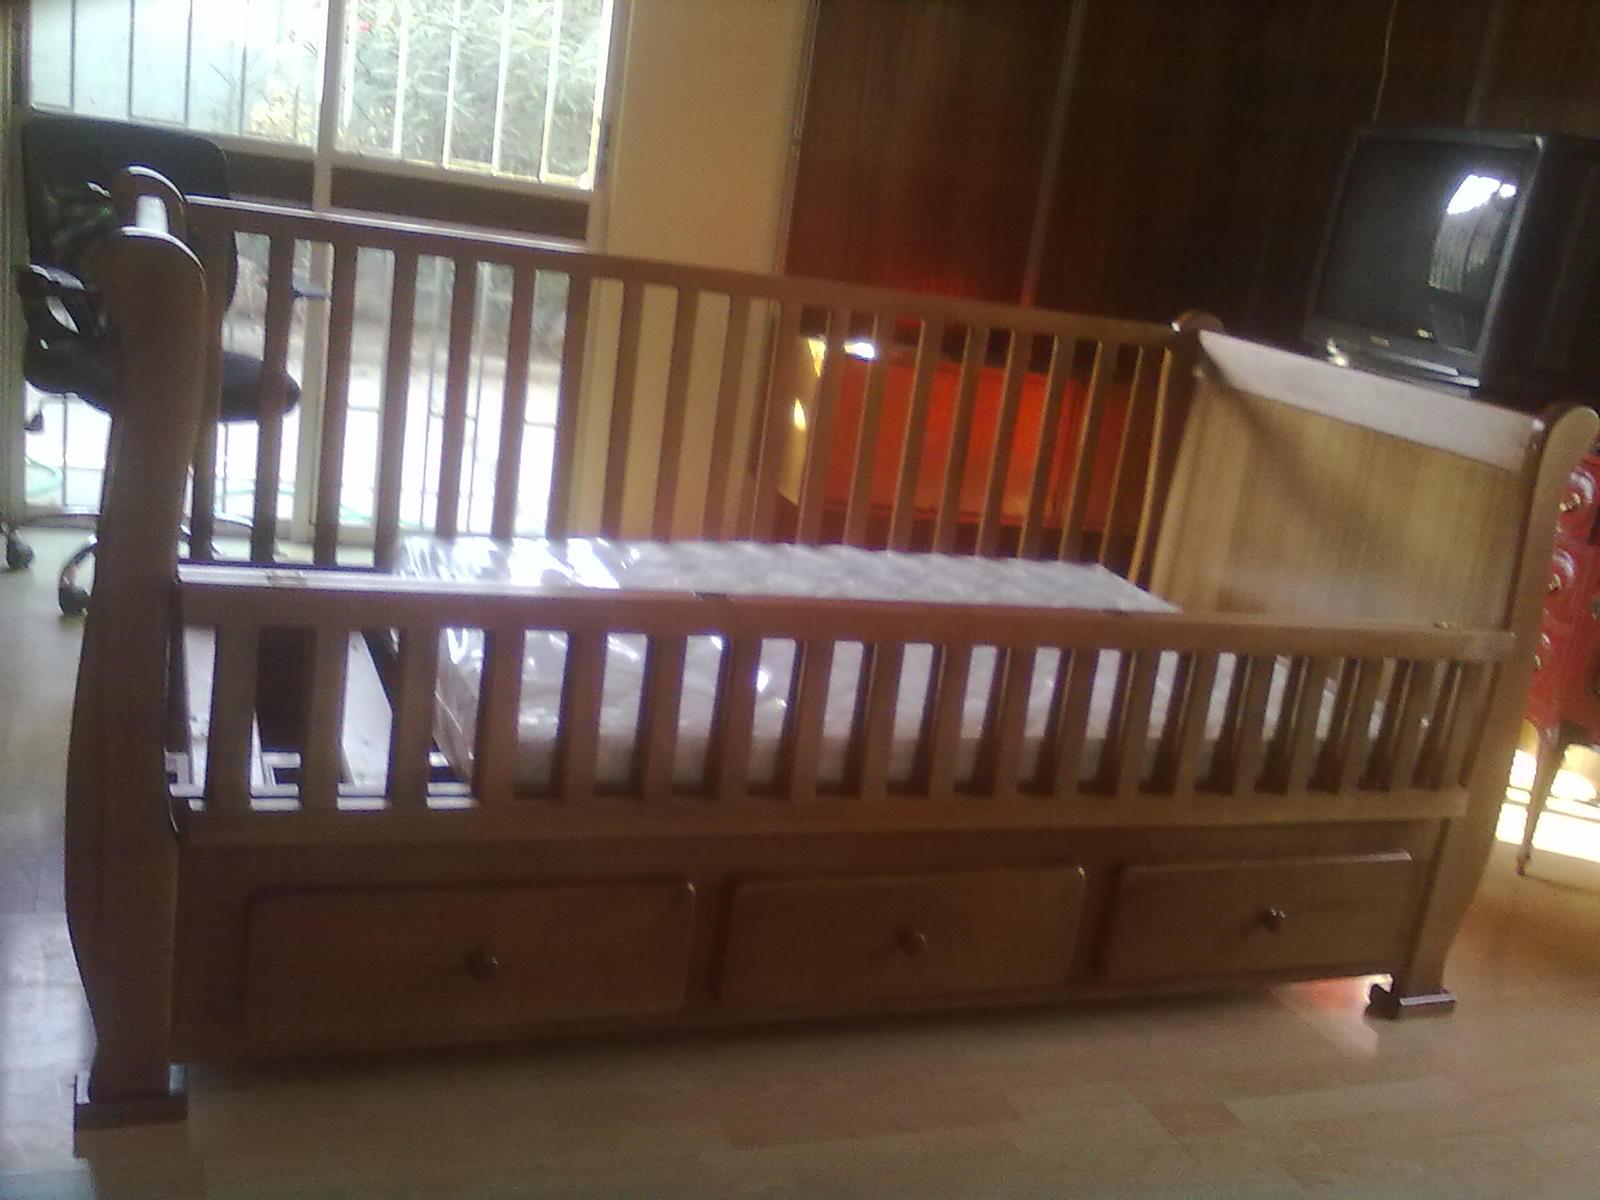 Muebles kotue cama cuna corral 1 plaza for Camas de 1 plaza baratas